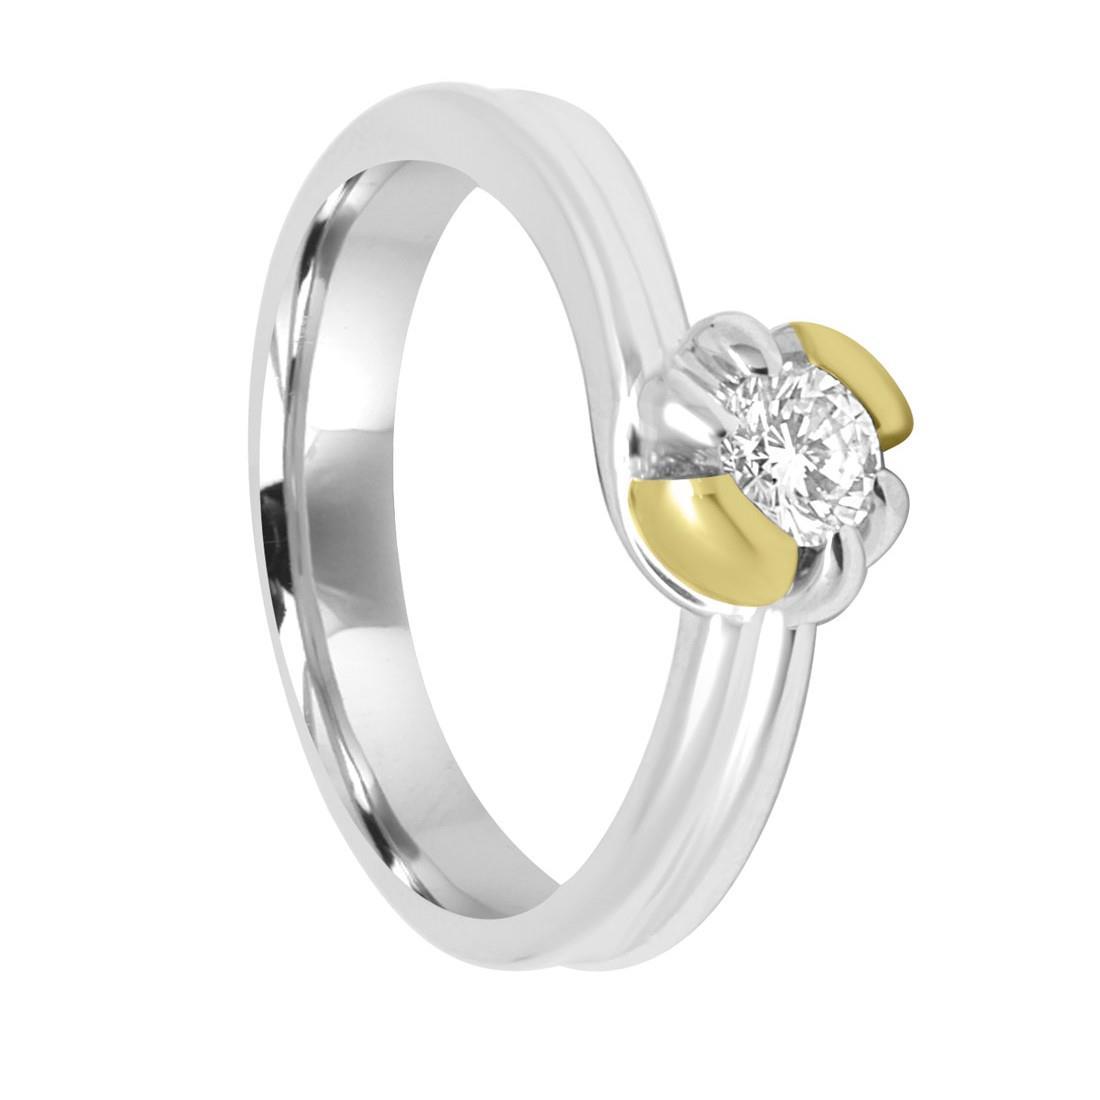 Anello Damiani con diamanti ct 0,43 - DAMIANI